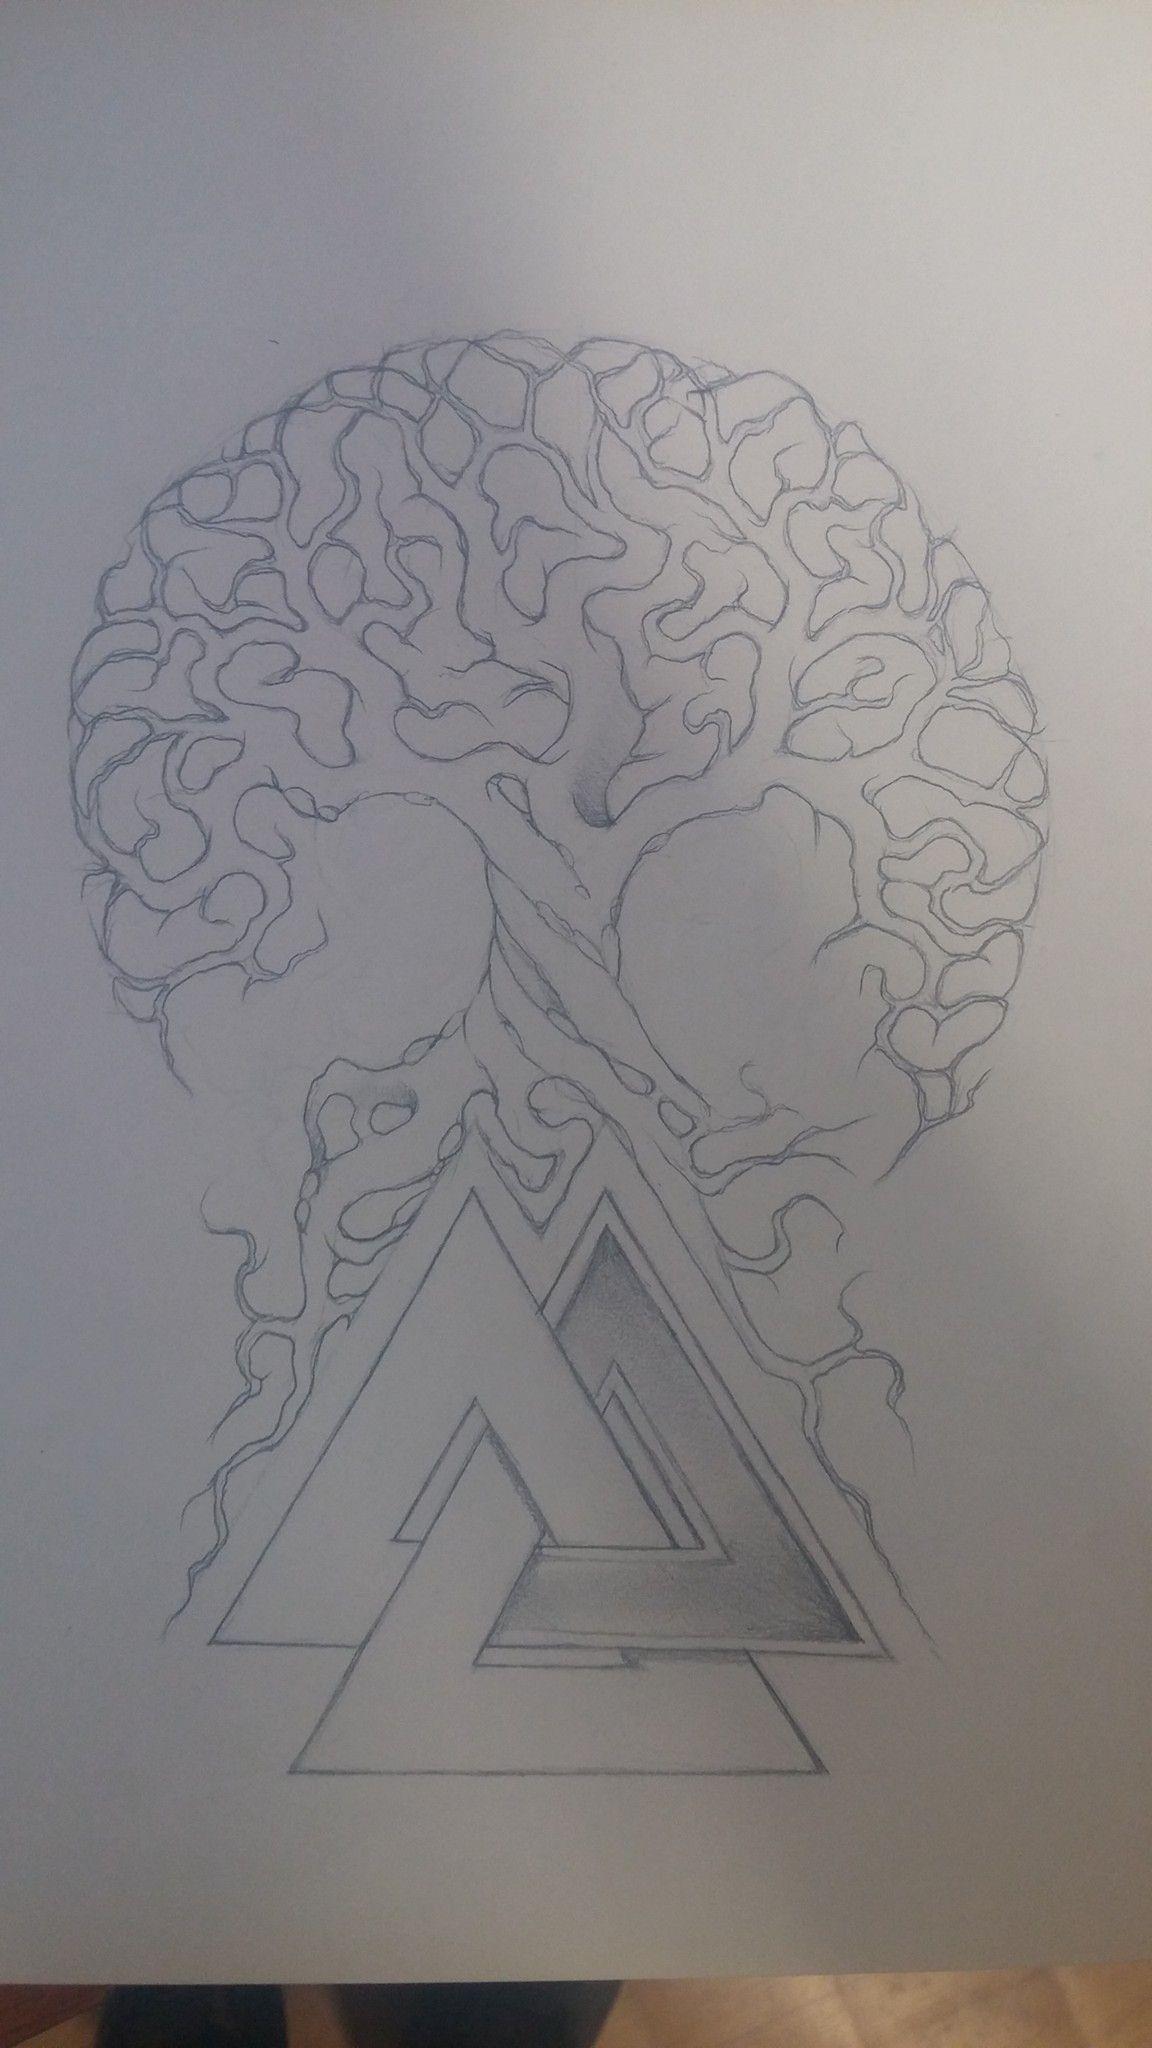 Yggdrasil Valknut Tattoo Treeoflife Drawing For Tattoo Yggdrasil